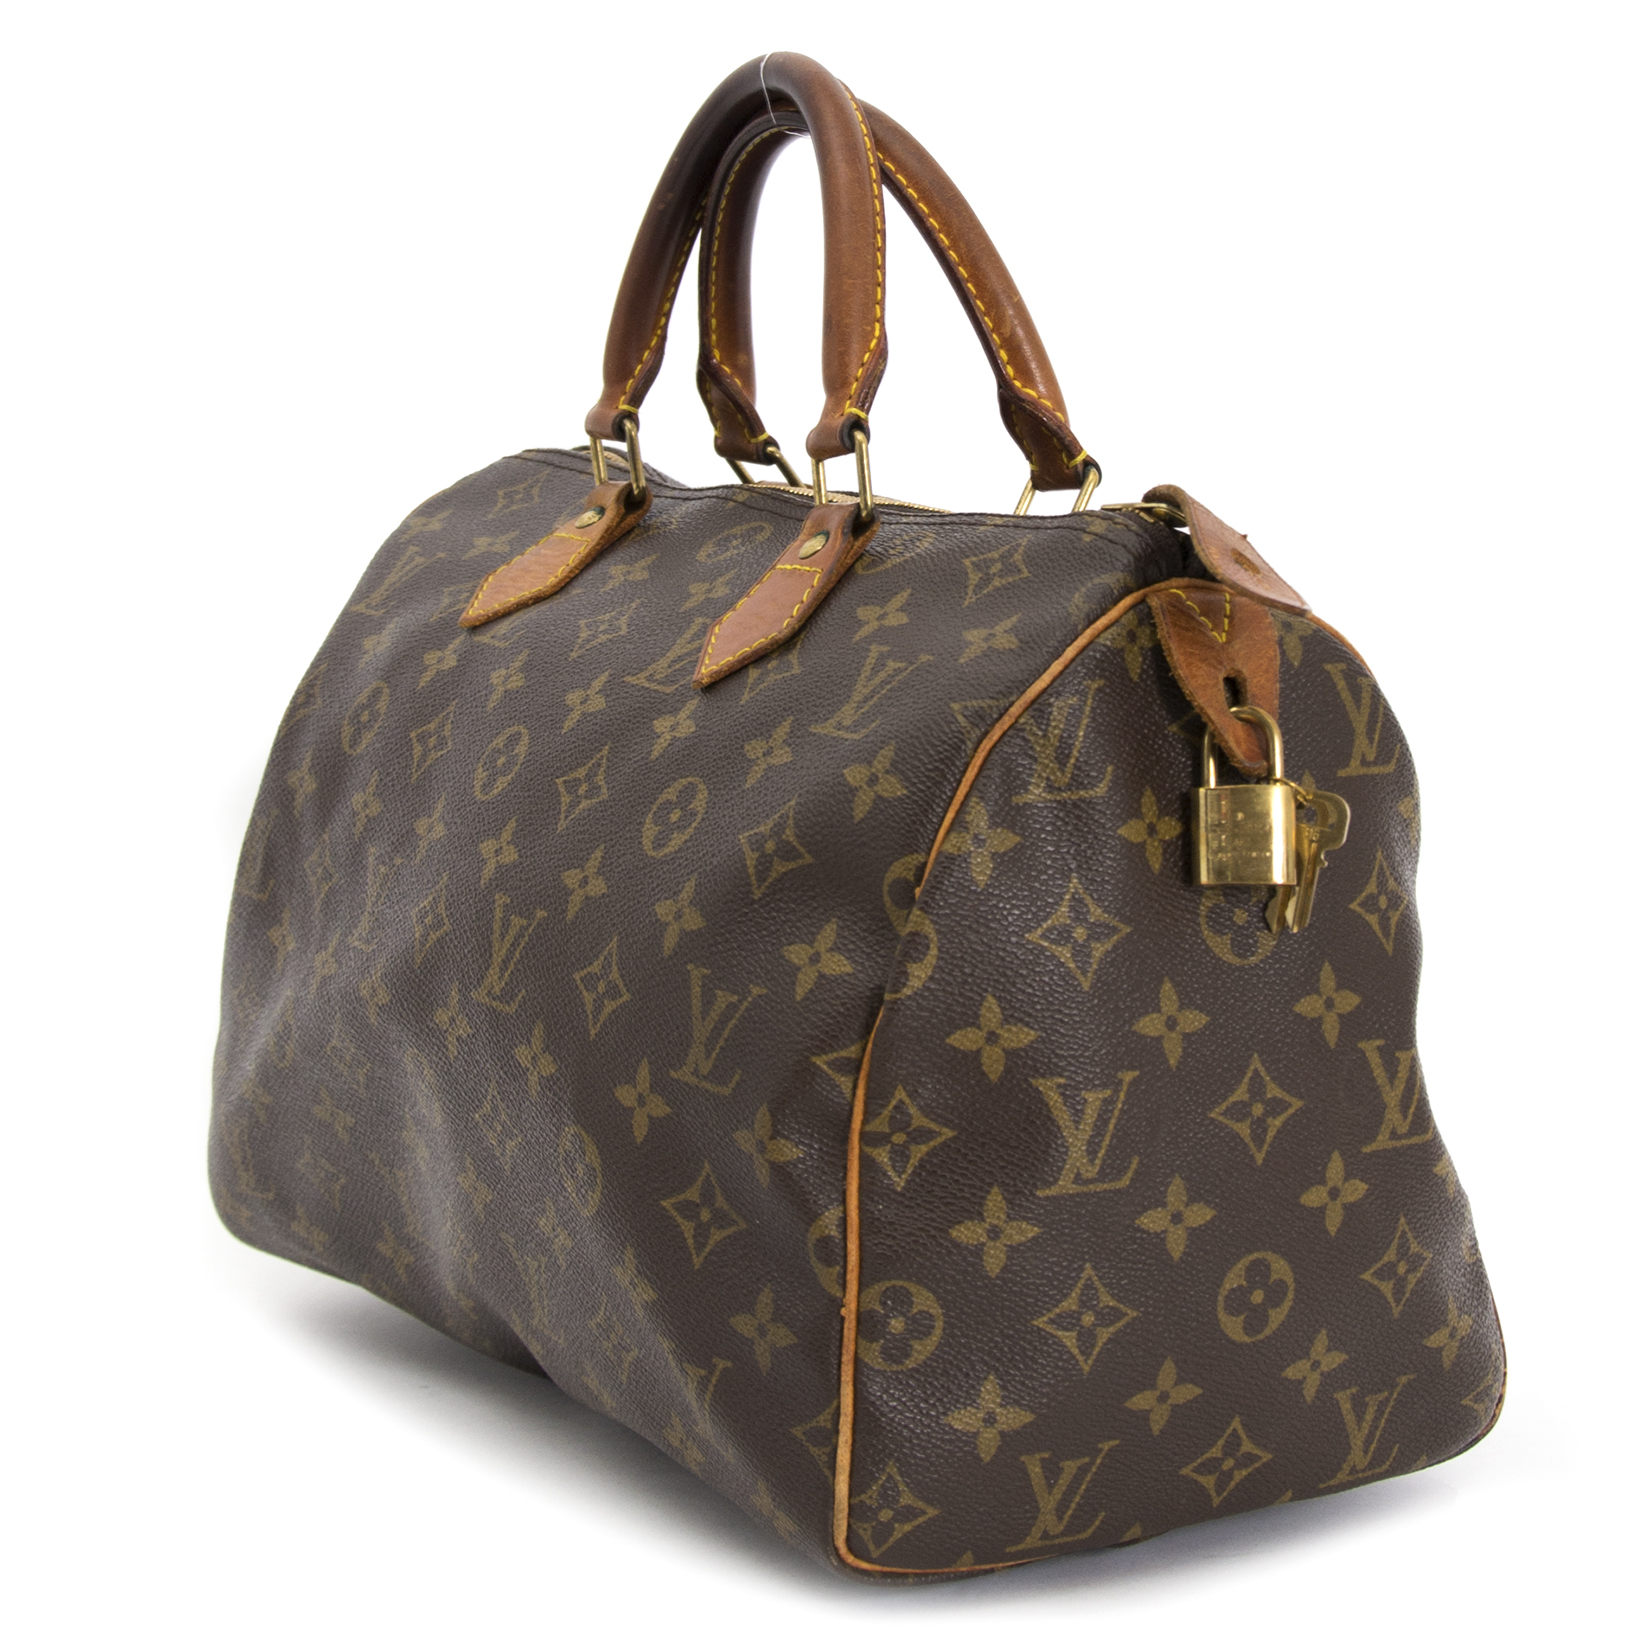 80dc1d0430c0 Labellov Shop safe online  authentic vintage Dior. Vind tweedehands ...